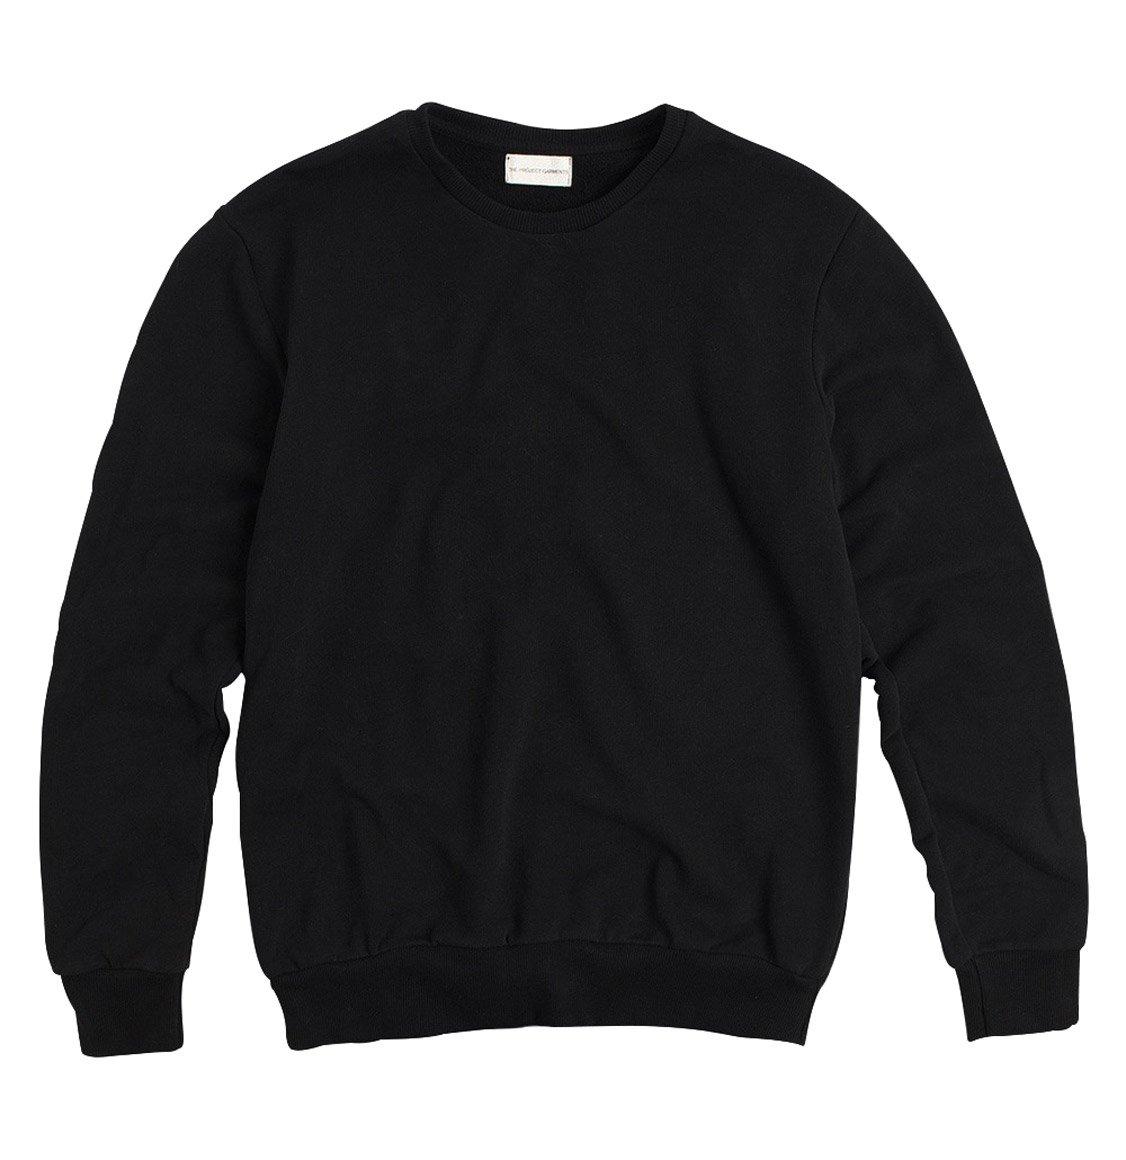 The Project Garments Crew Neck Organic Cotton Sweatshirt Black